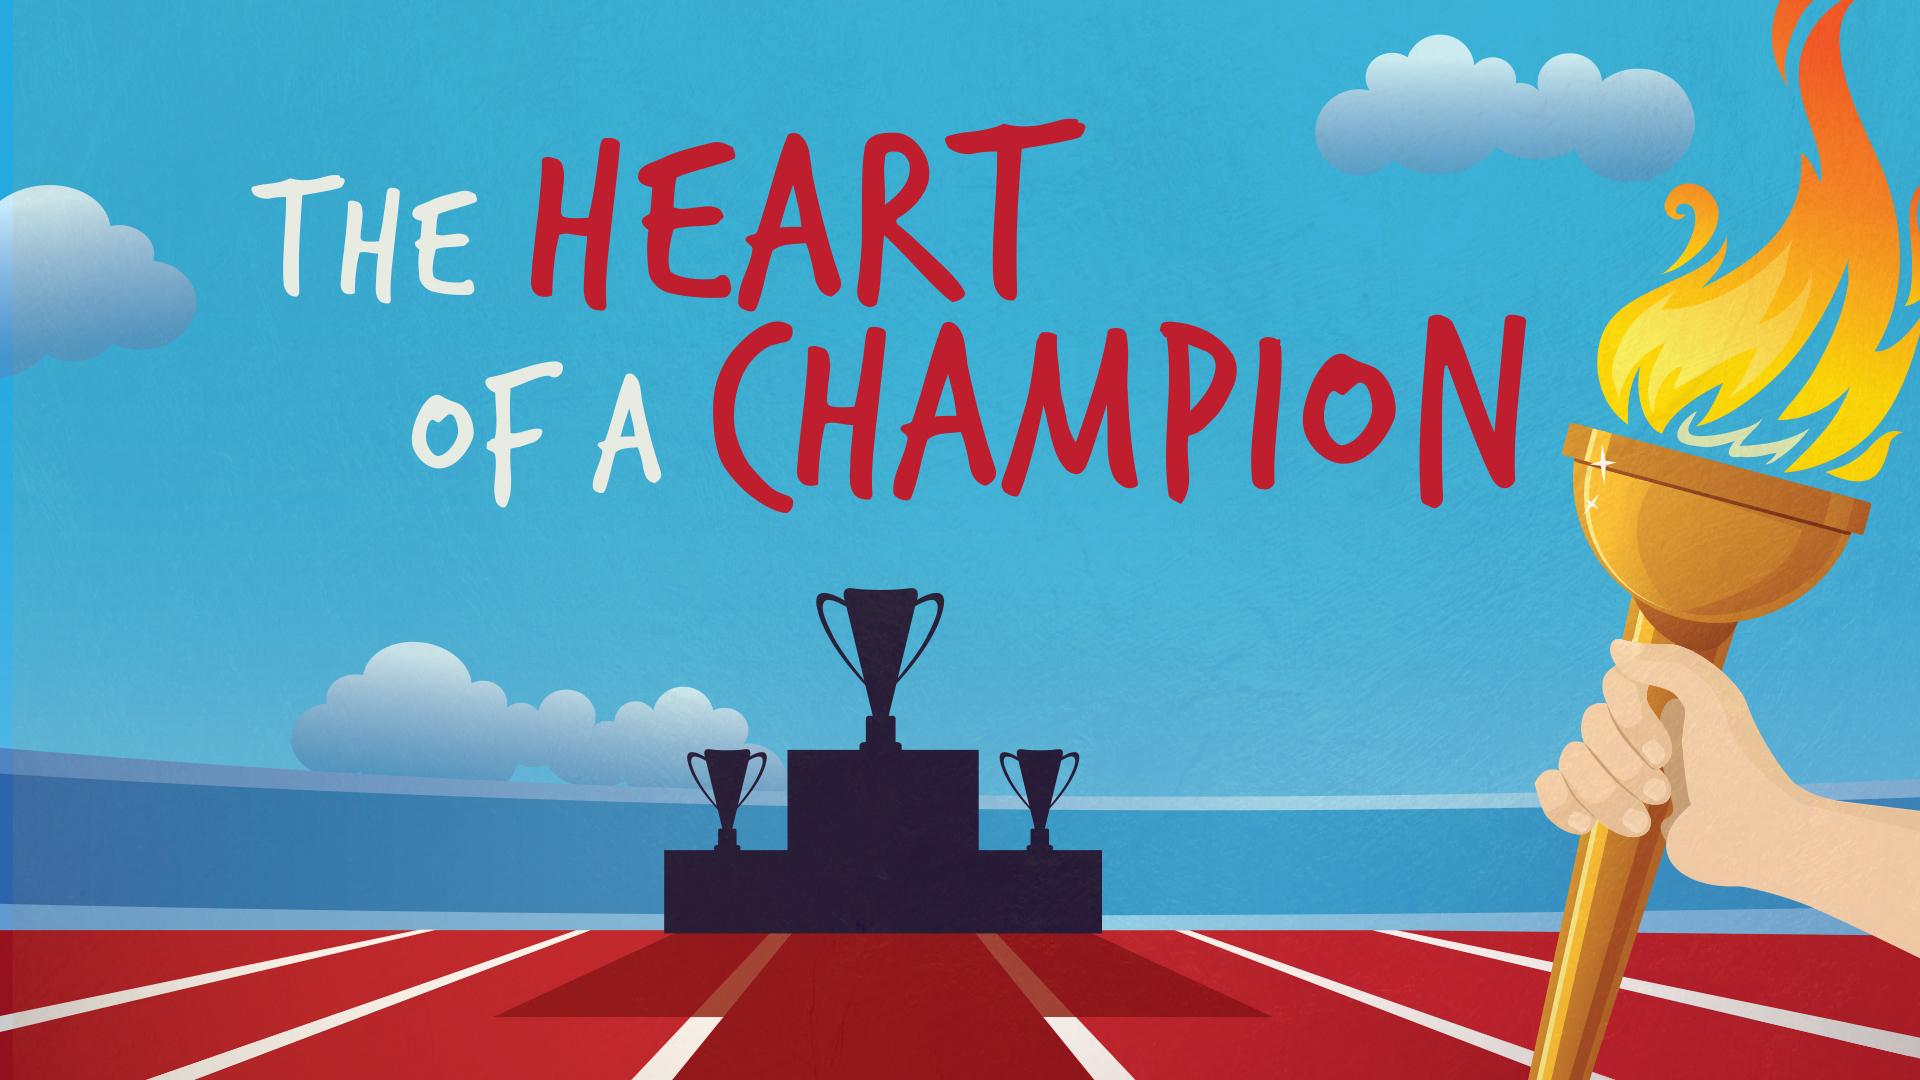 Heart+of+Champion.jpg